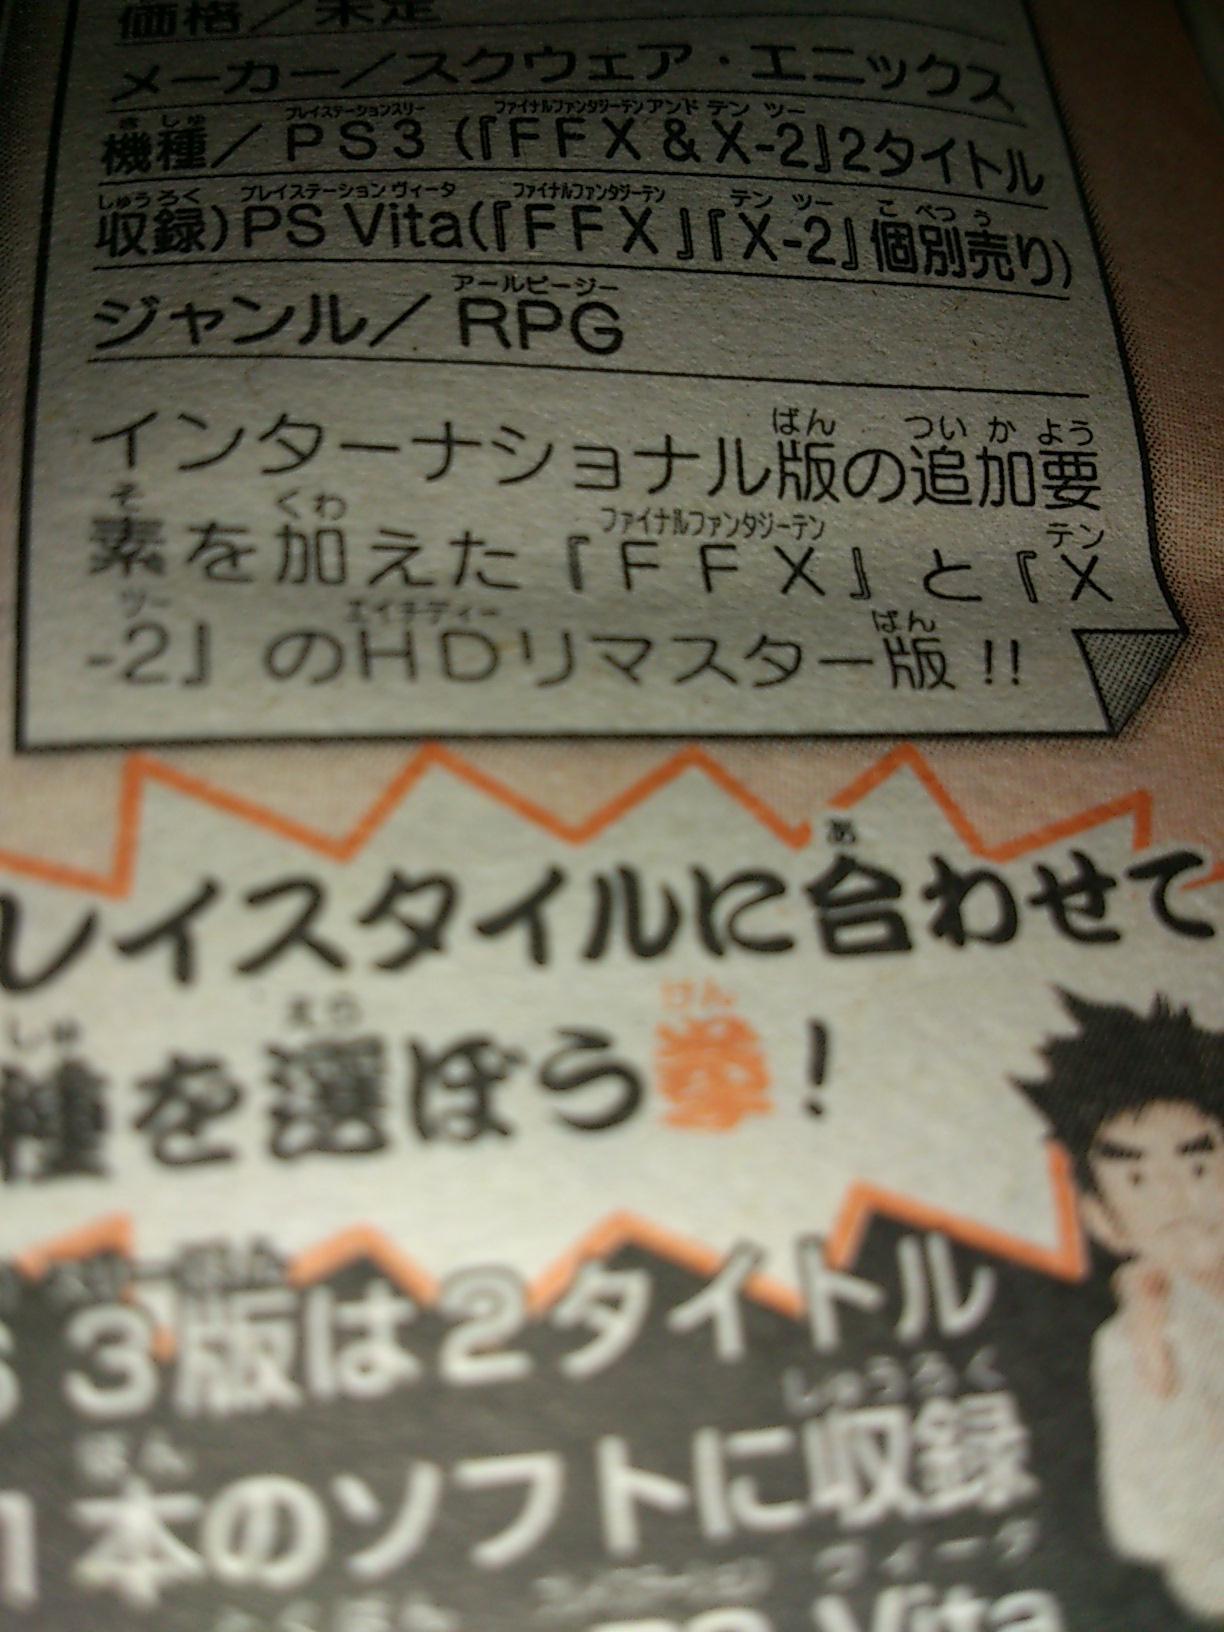 Final Fantasy FFXHD-Jump-Info_03-19